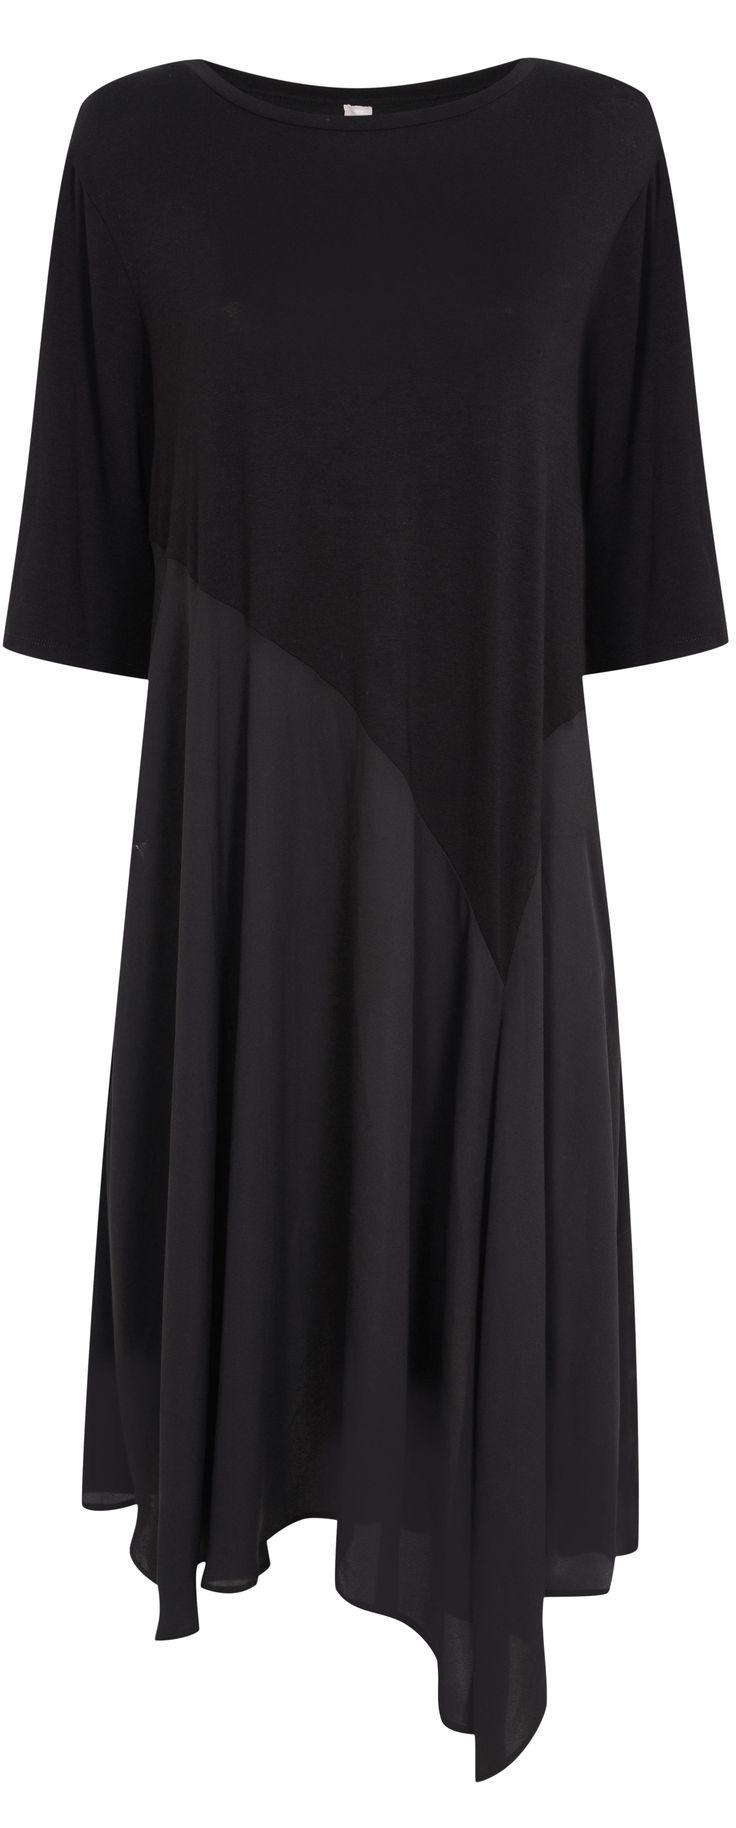 Asymmetric hemline dress for plus sizes. Read fashion tips: http://www.boomerinas.com/2015/10/04/petite-plus-size-brands-womens-fashion-tips-for-cruisewear-casual-wear-eveningwear/